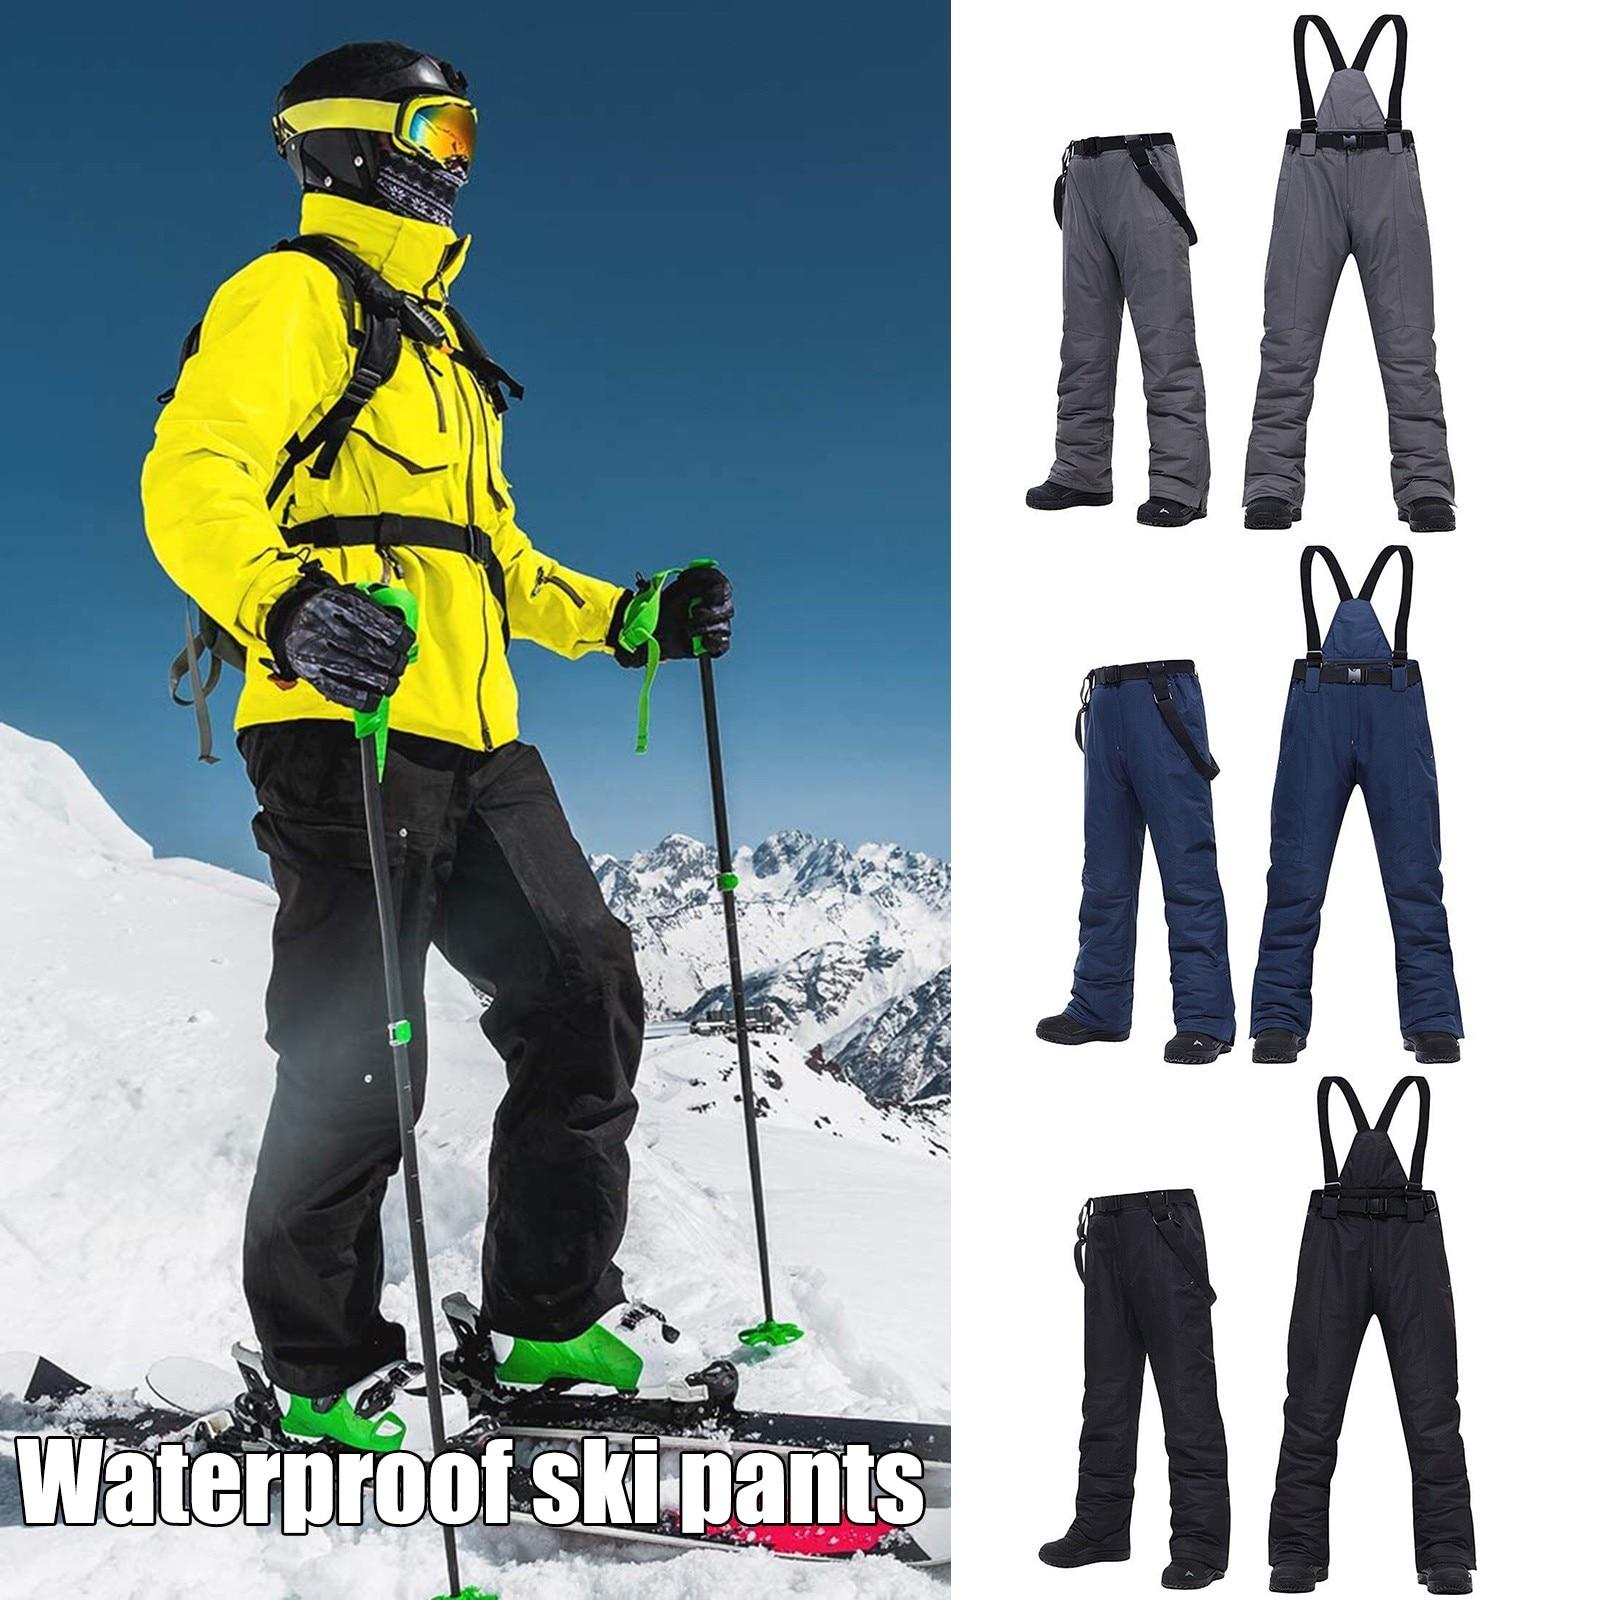 Women Men Ski Suspenders Pants Waterproof Insulated Snowboard Snow Pants Winter Outdoor Skiing Hiking Trekking Trousers 2021